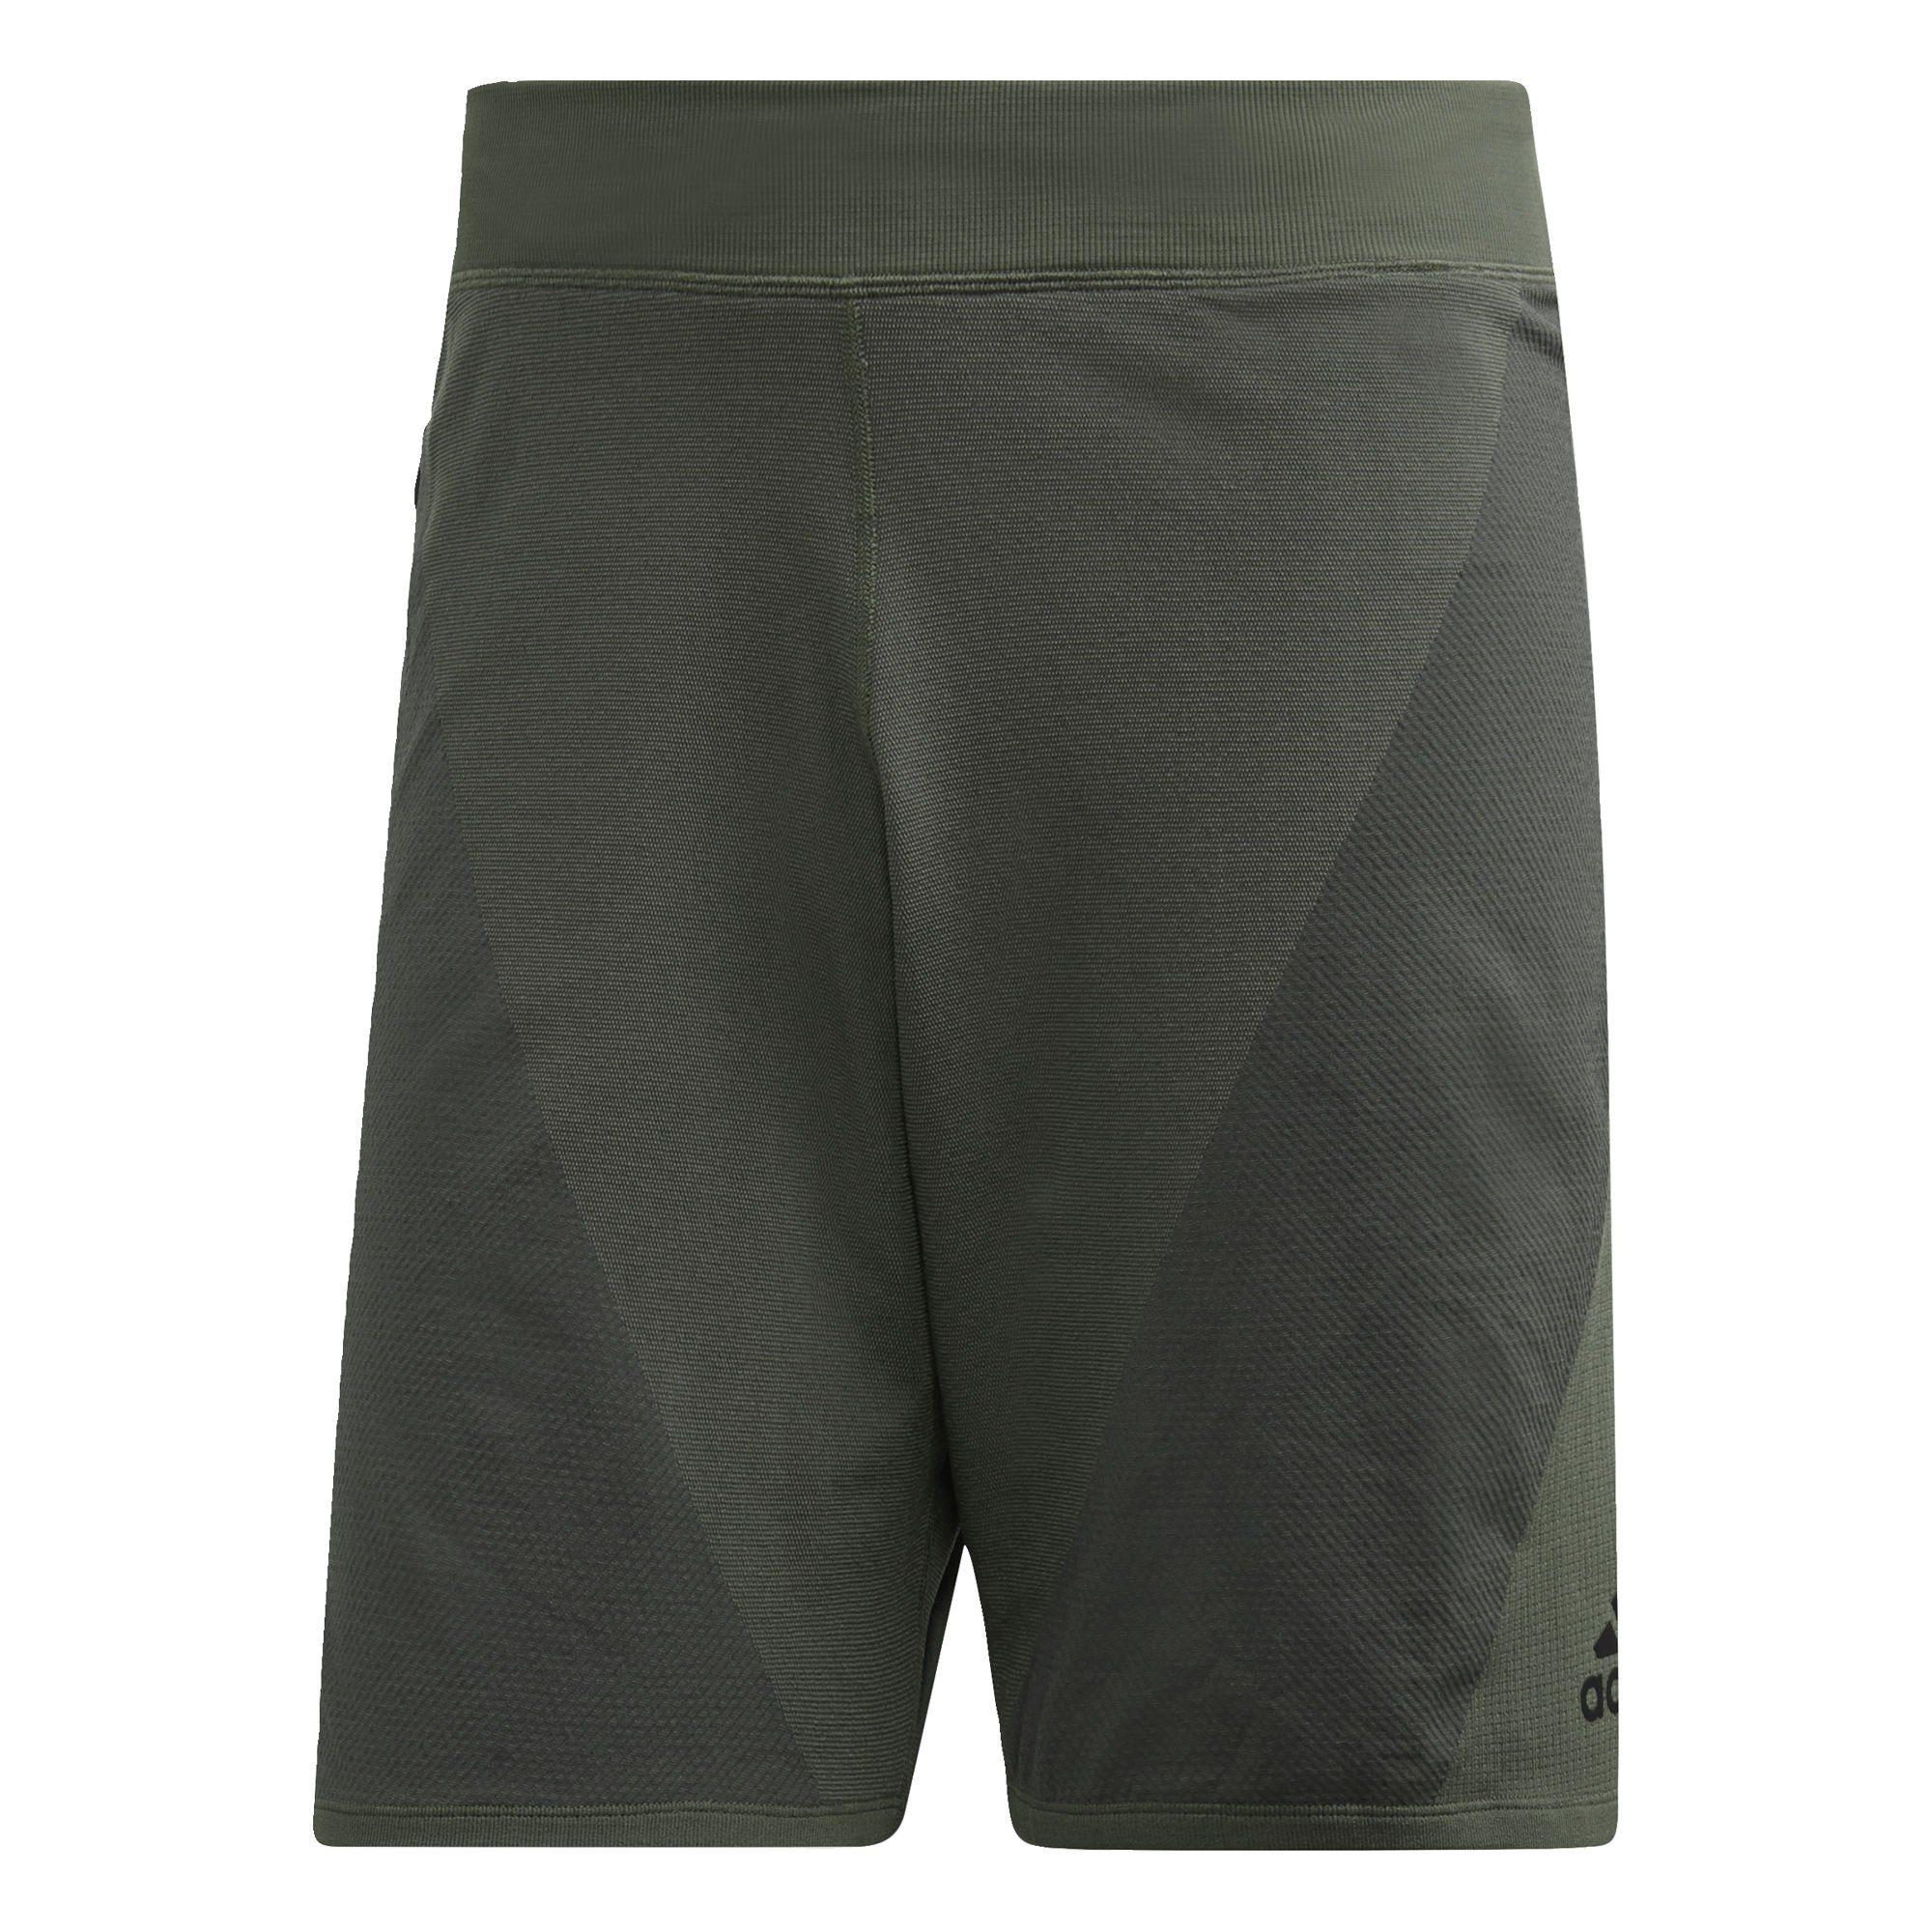 Adidas 4KRFT Short Prime Trainingshose Herren online